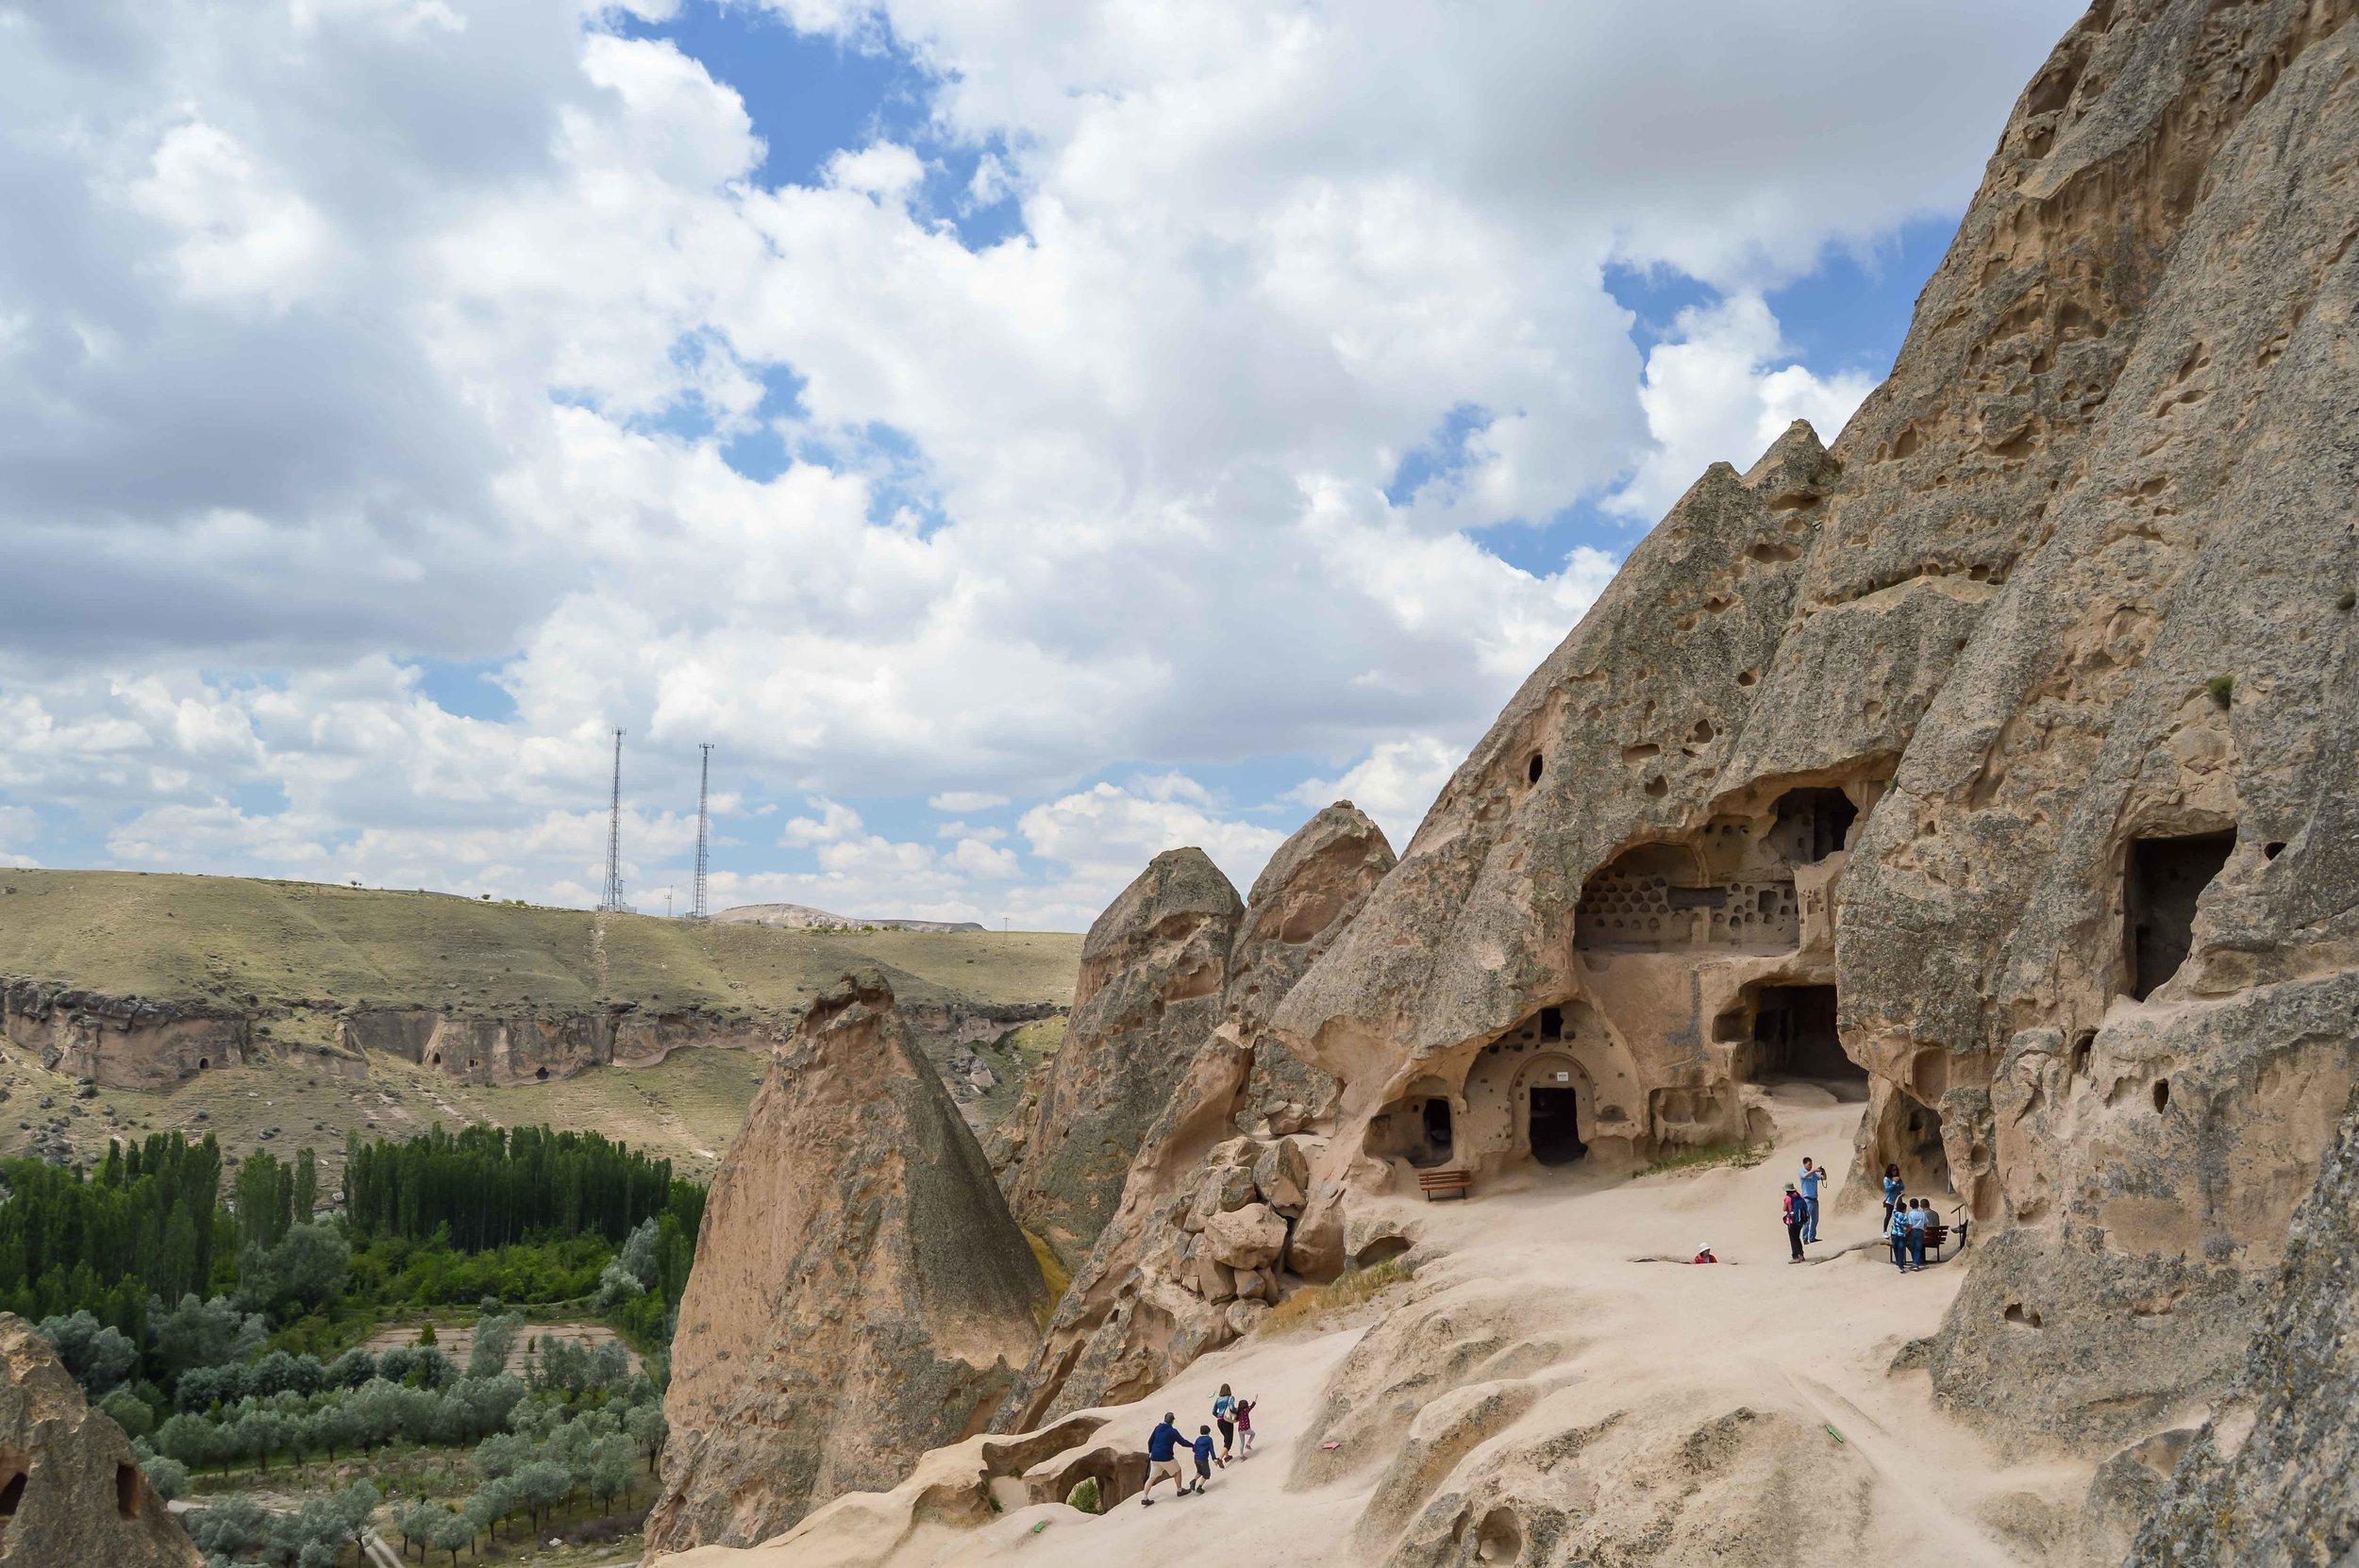 Selime Monastery Caves  Cave Dwellings Skyline Sunset Blue Sky Turkey Cappadocia Anatolia Göreme Desert Arid